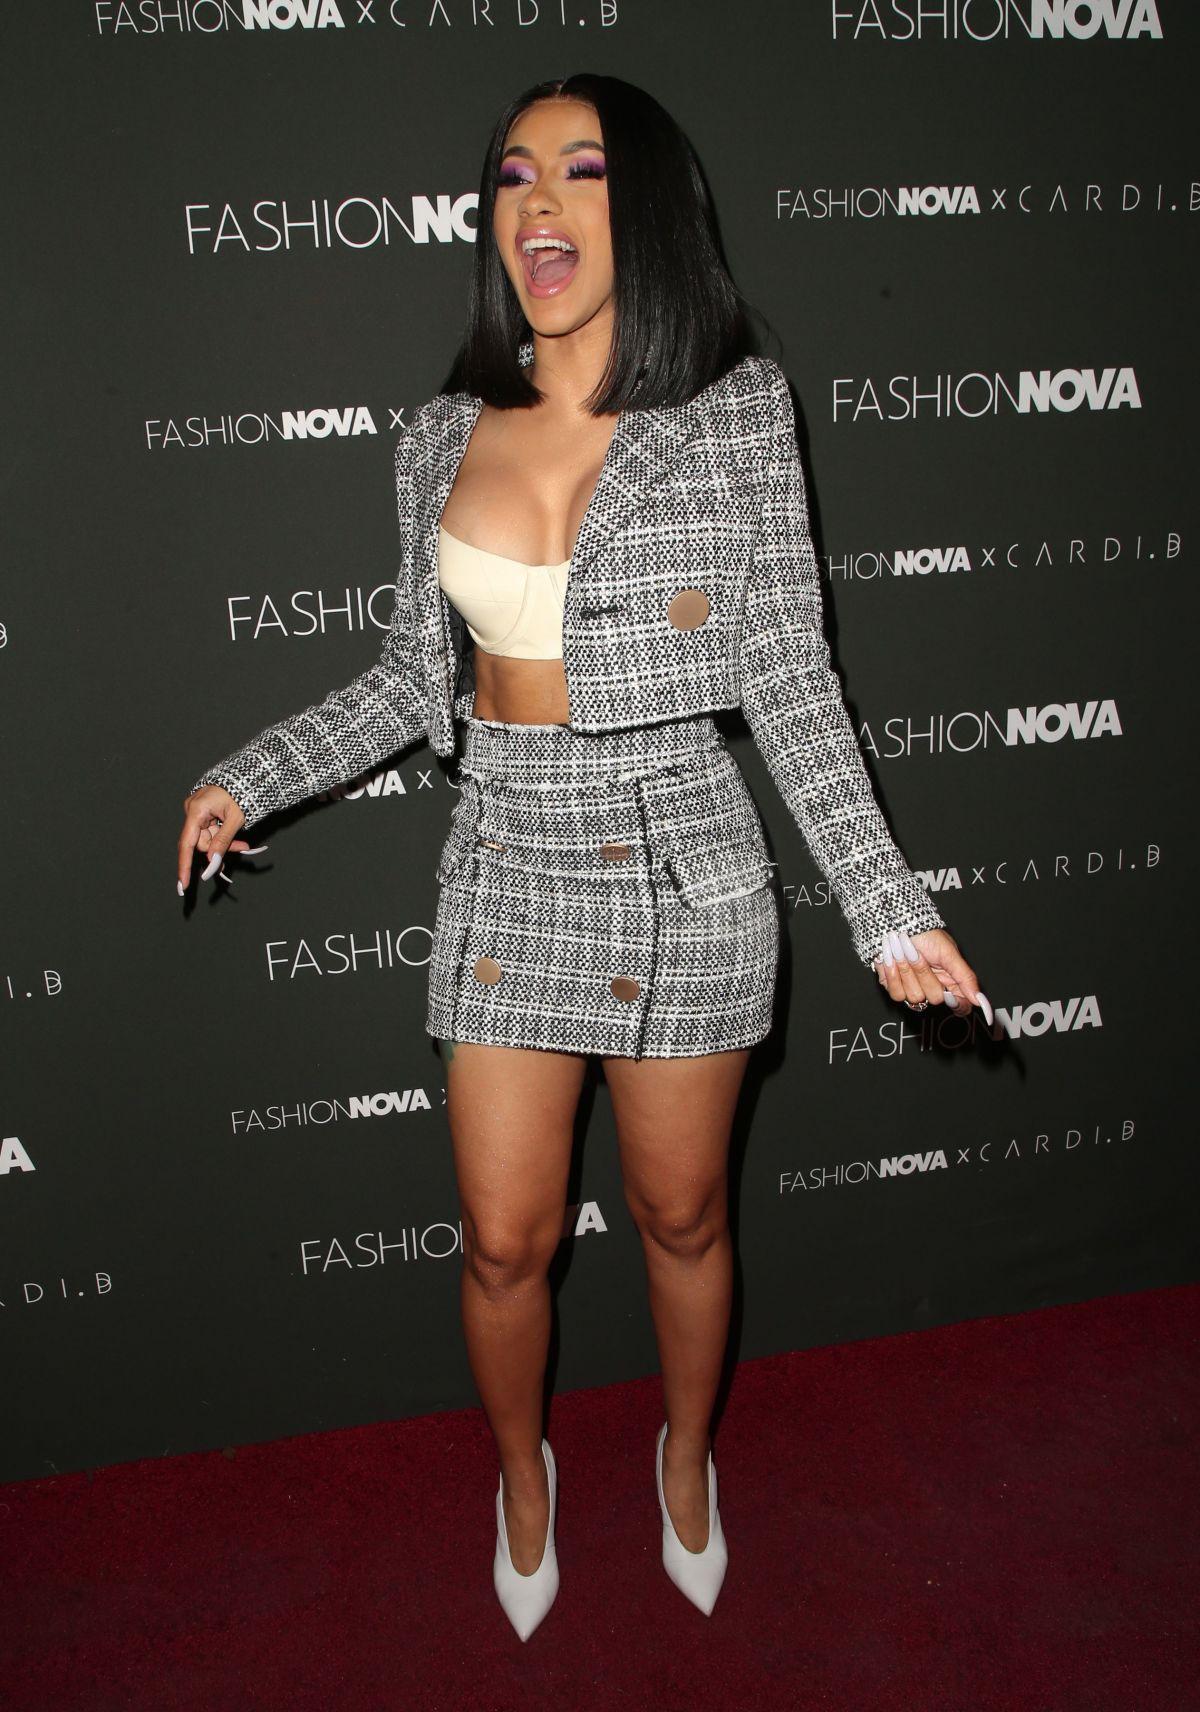 Cardi B No Clothing: CARDI B At Fashion Nova X Cardi B Launch In Los Angeles 11